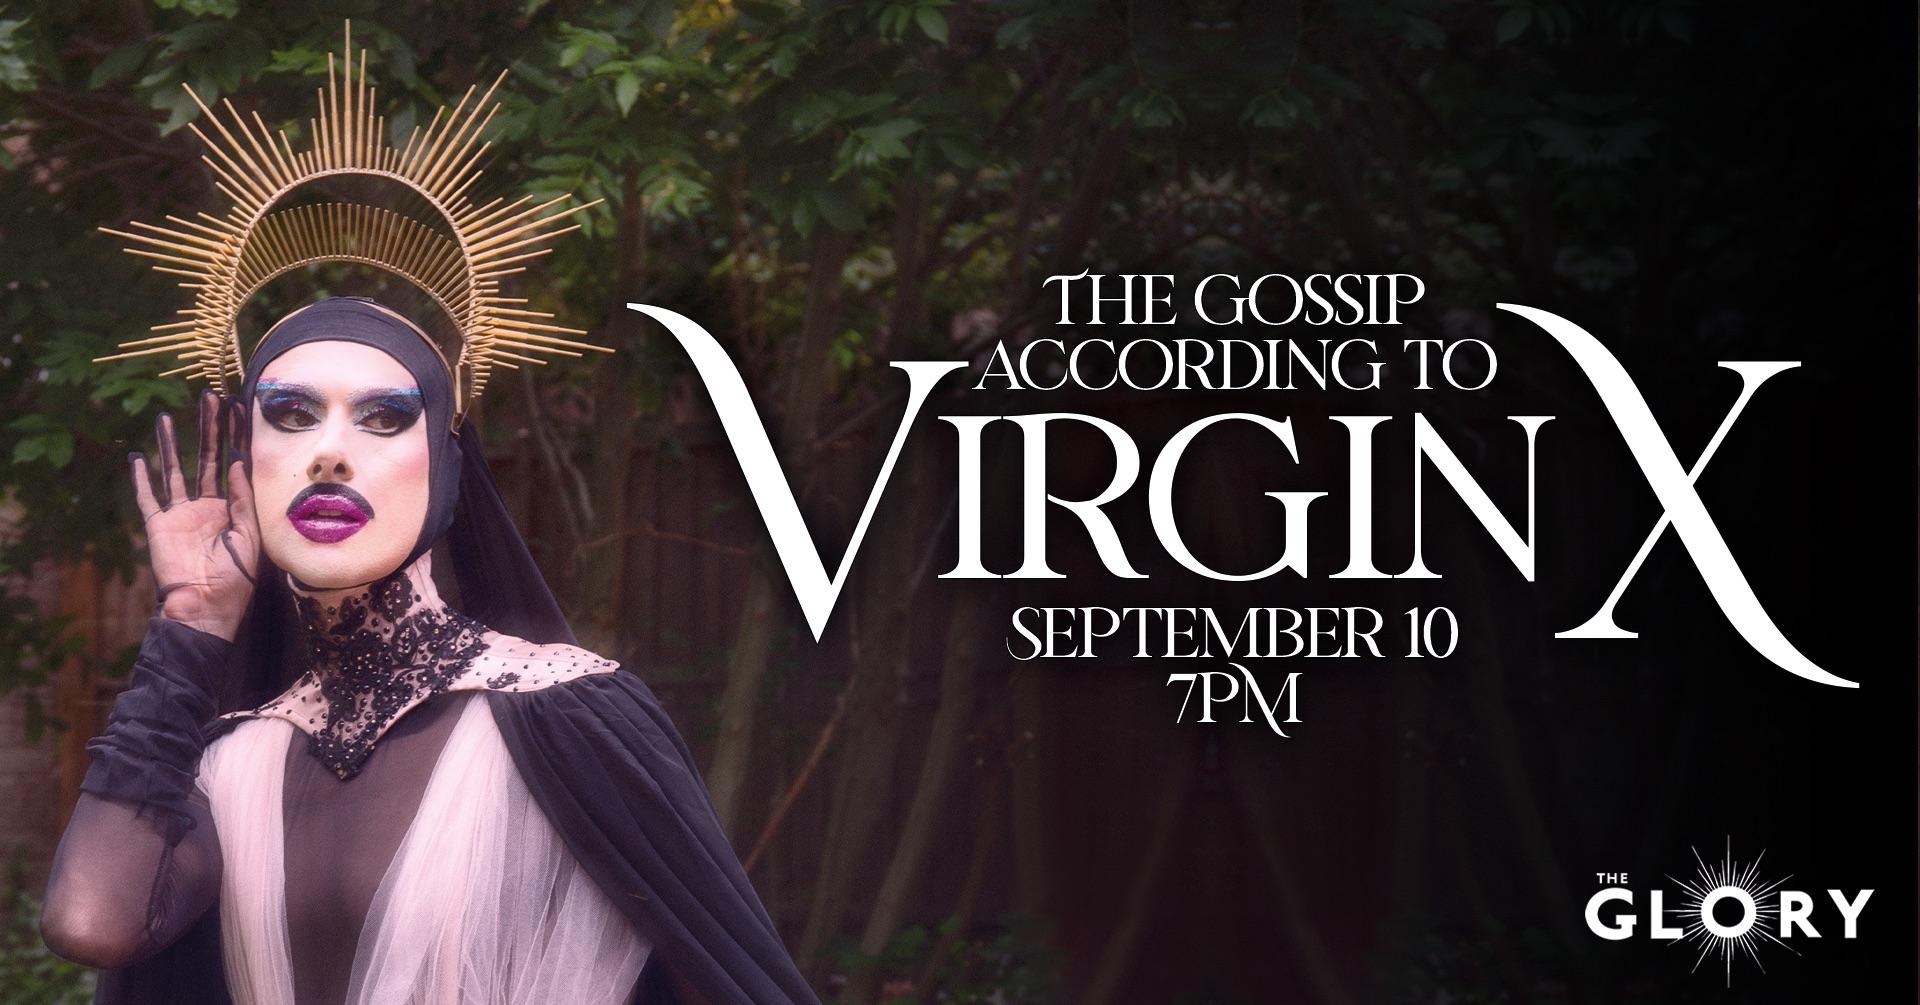 The Gossip According to Virgin X